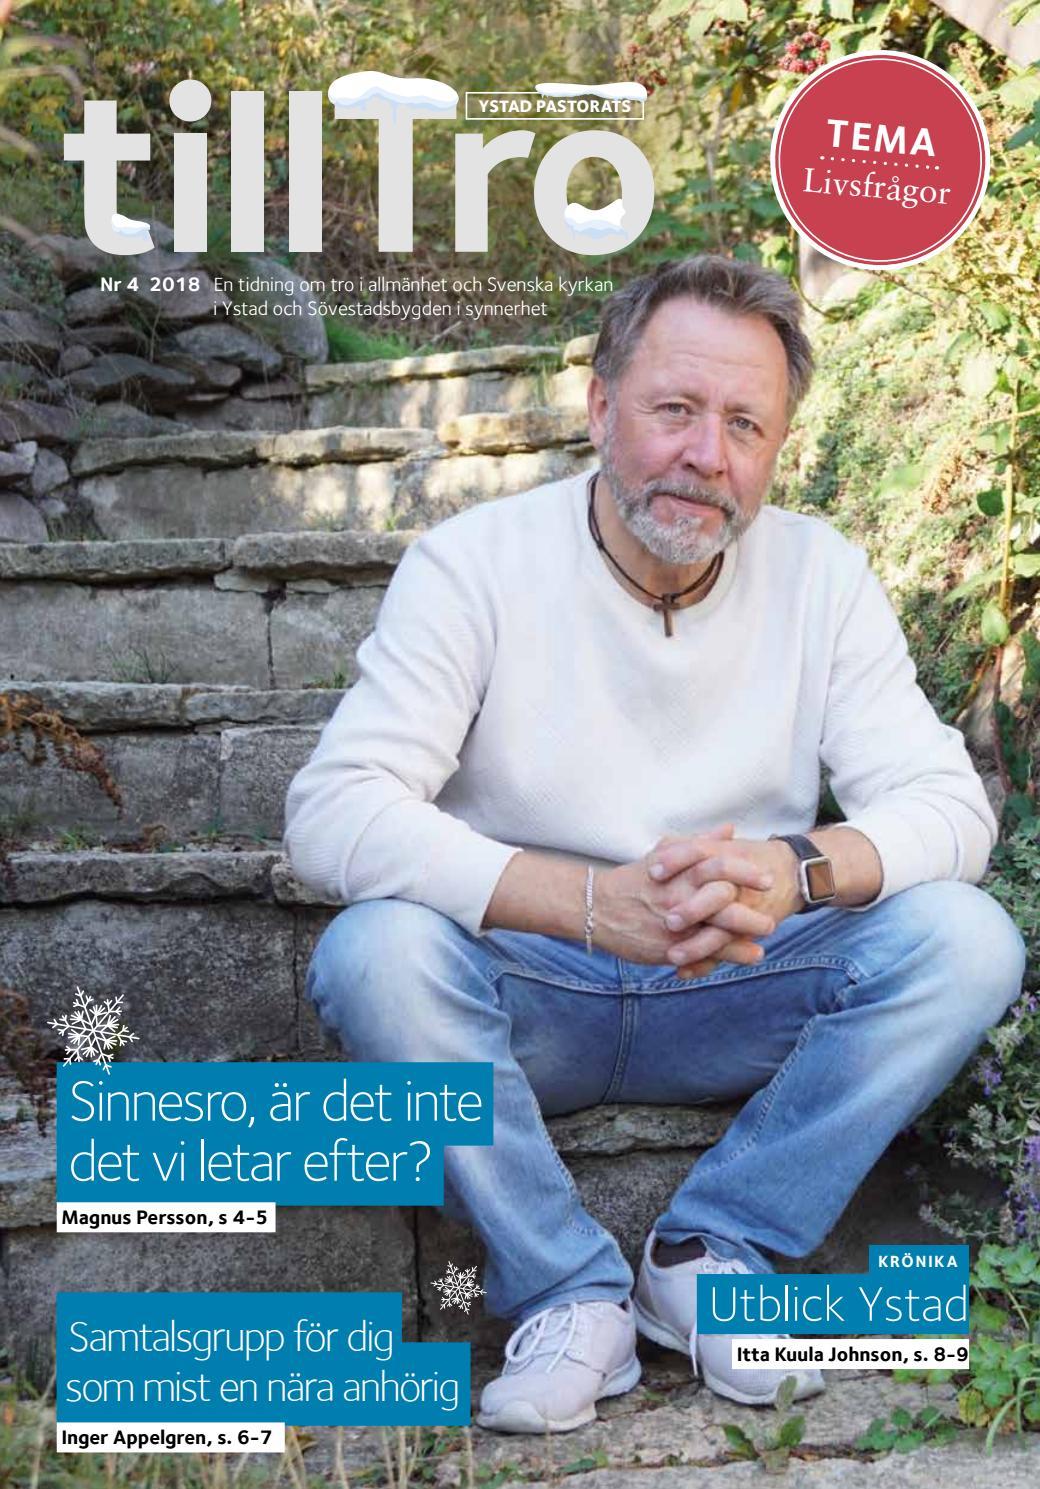 Eneborgsvgen 13 Skne ln, Ystad - patient-survey.net